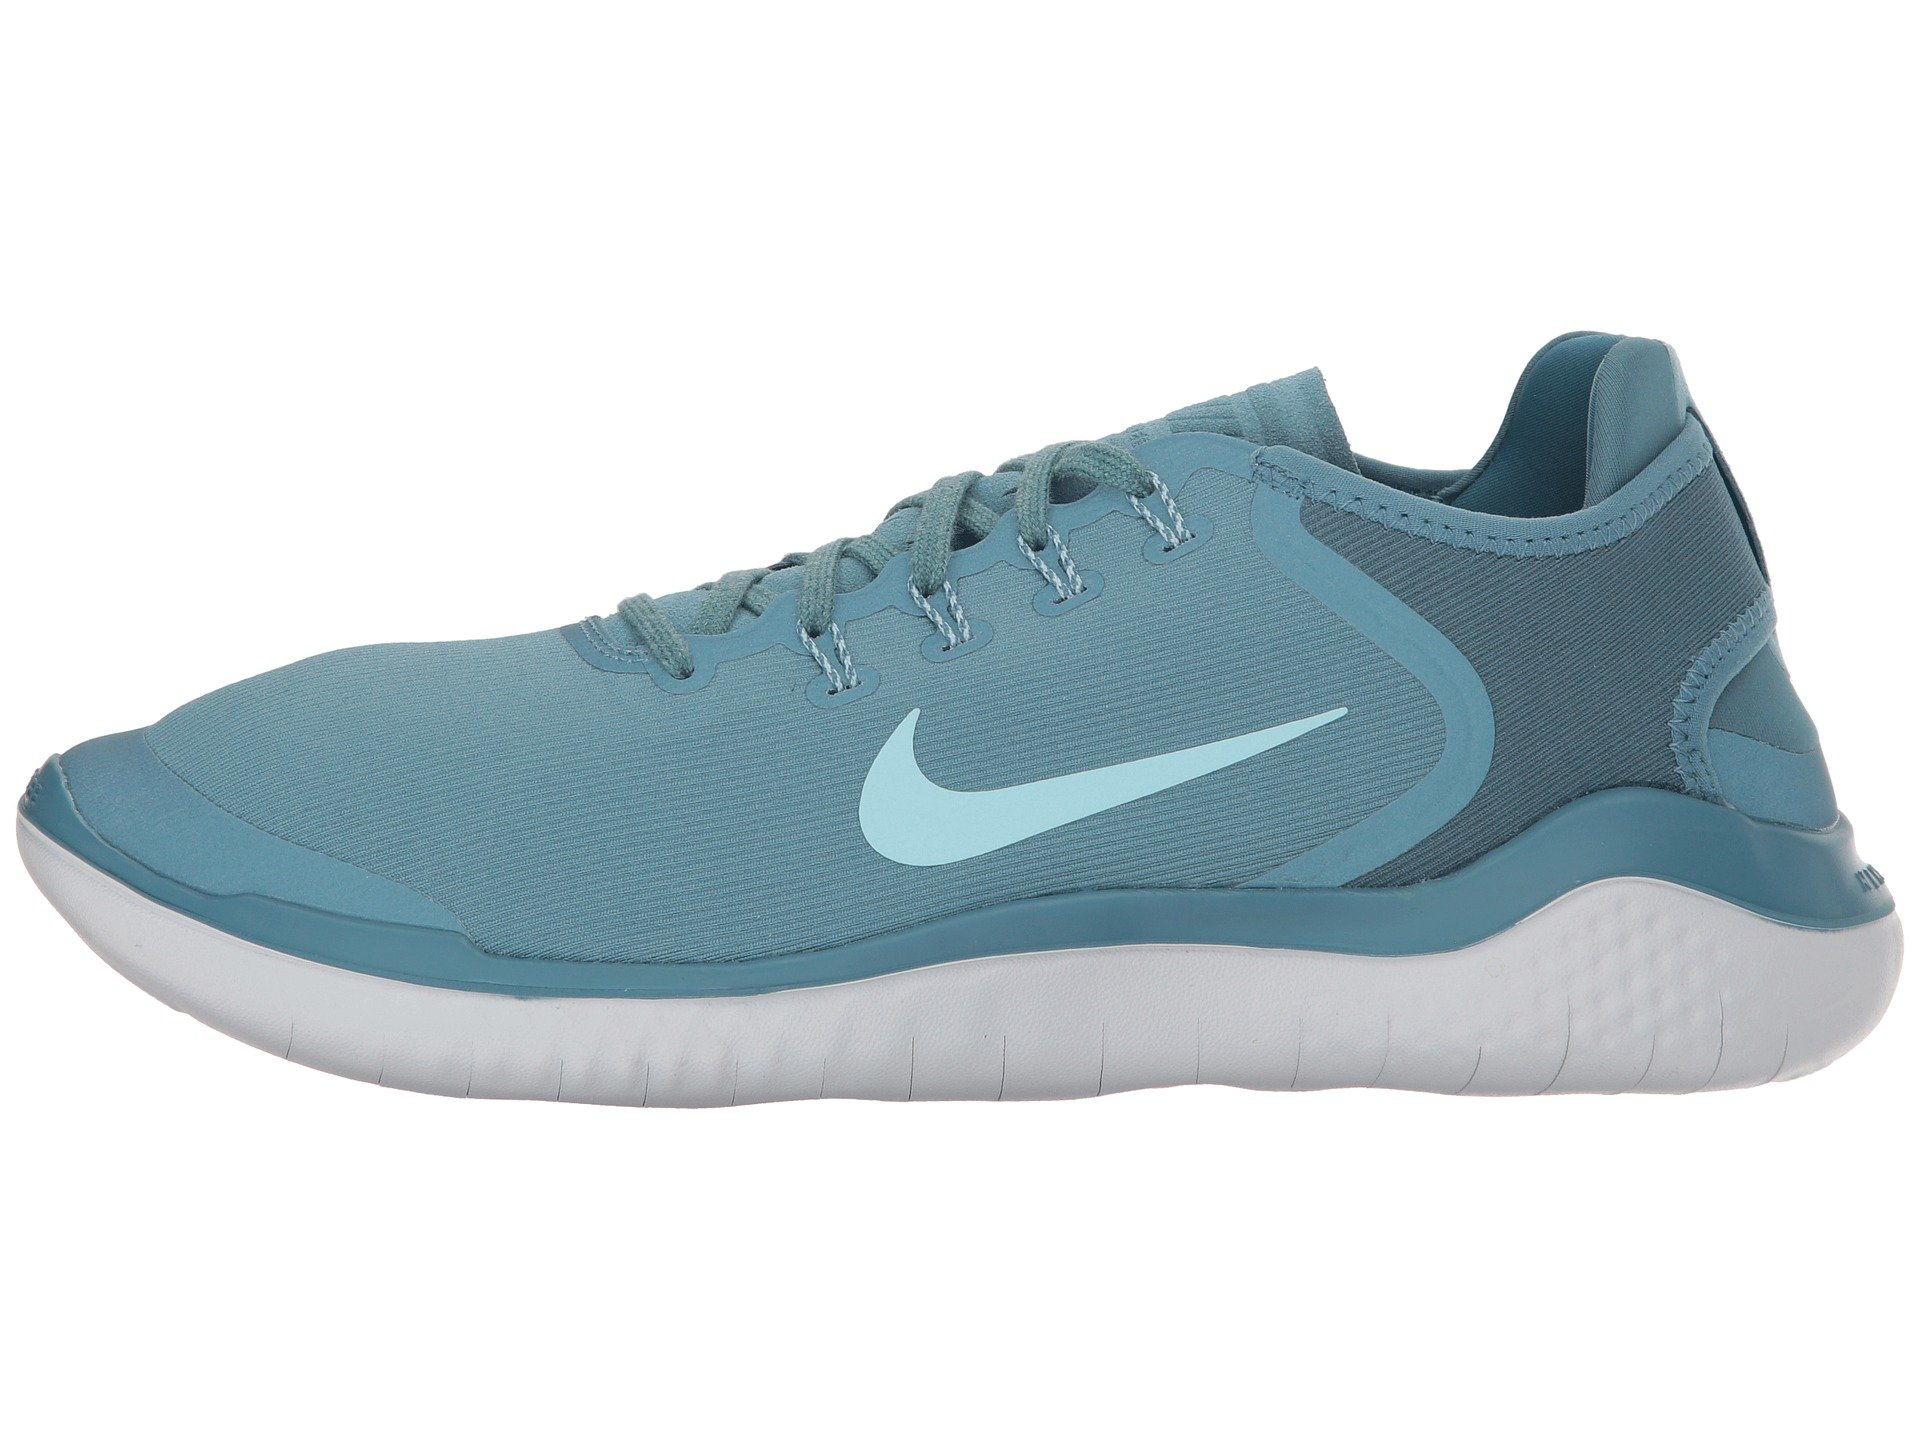 Nike Free RN 2018 Sun Running Shoe (8 D(M) US, Noise Aqua/Pure Platinum) by Nike (Image #6)